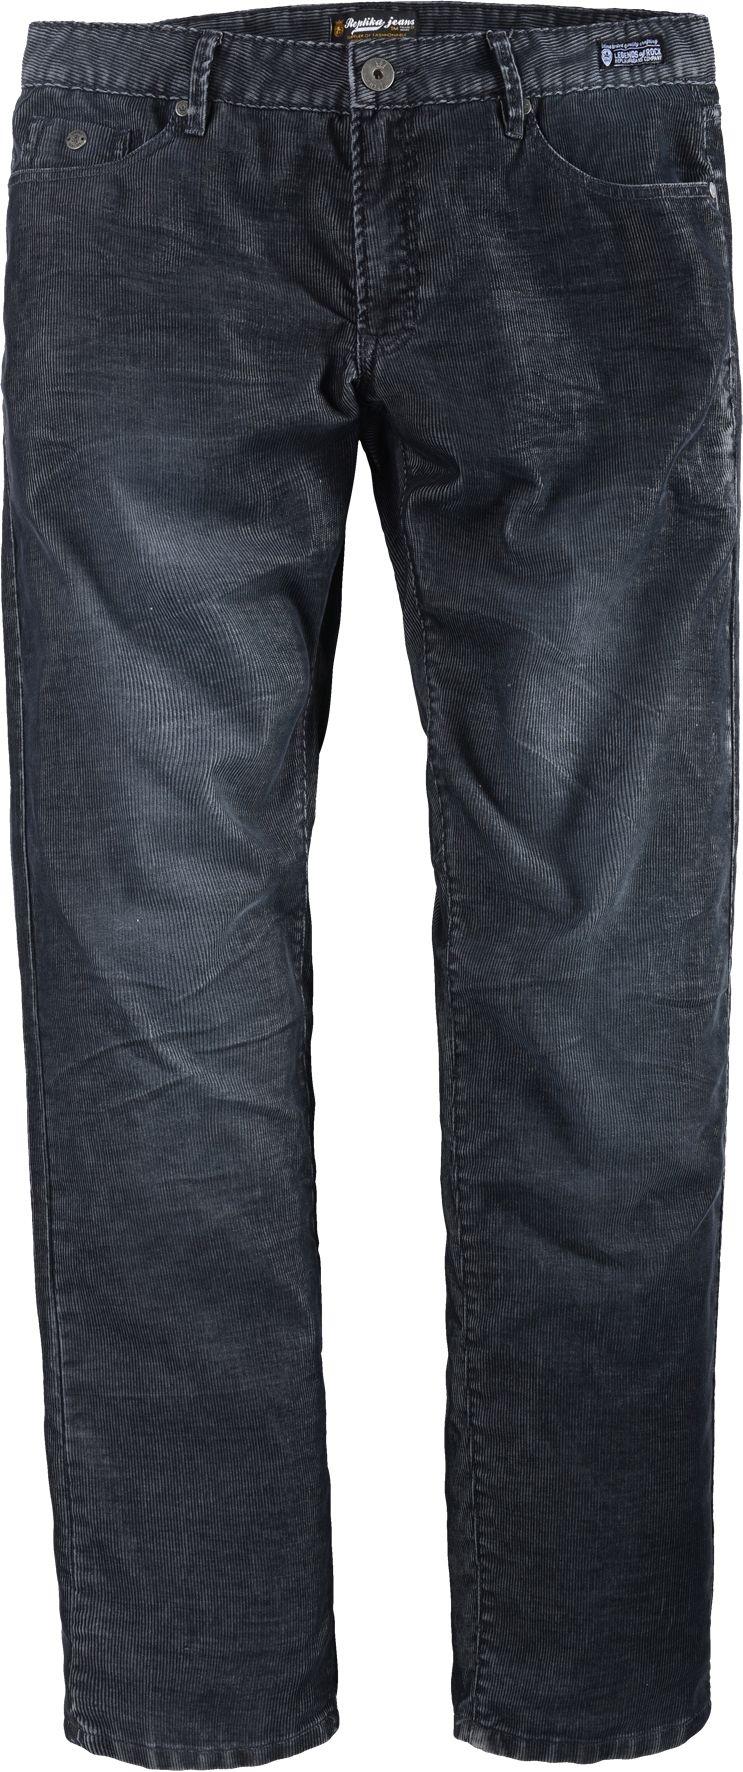 Replika Corduroy broek L34, donkergrijs